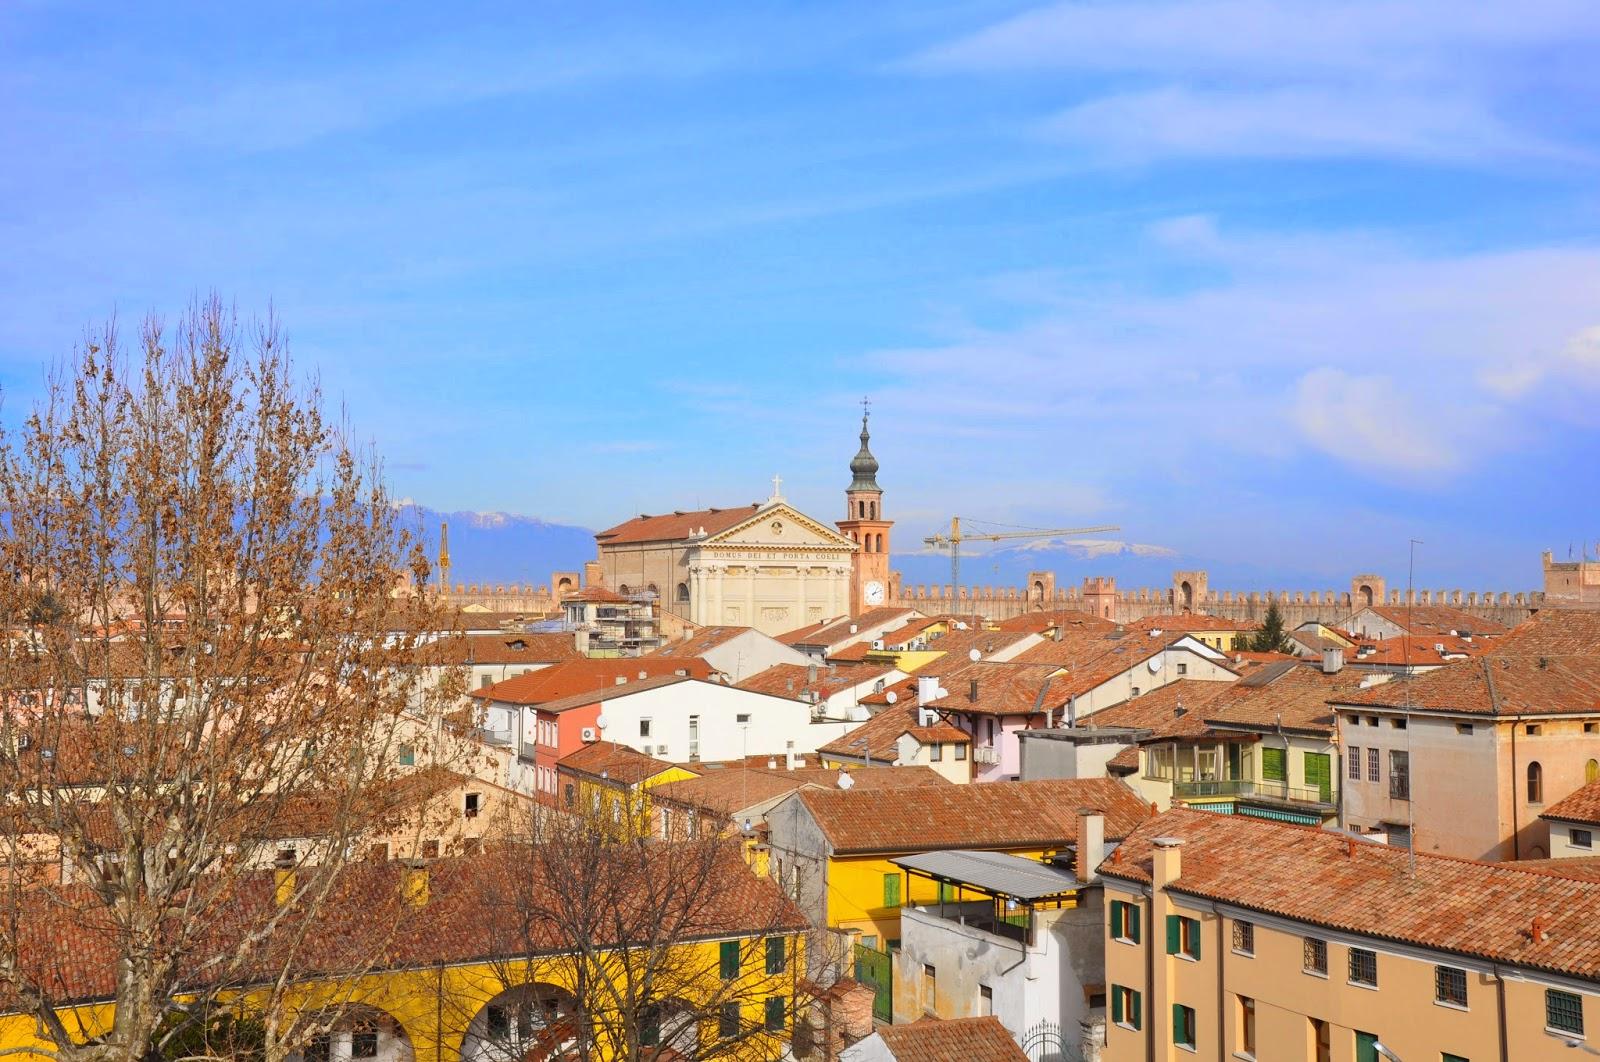 town Cittadella medieval wall